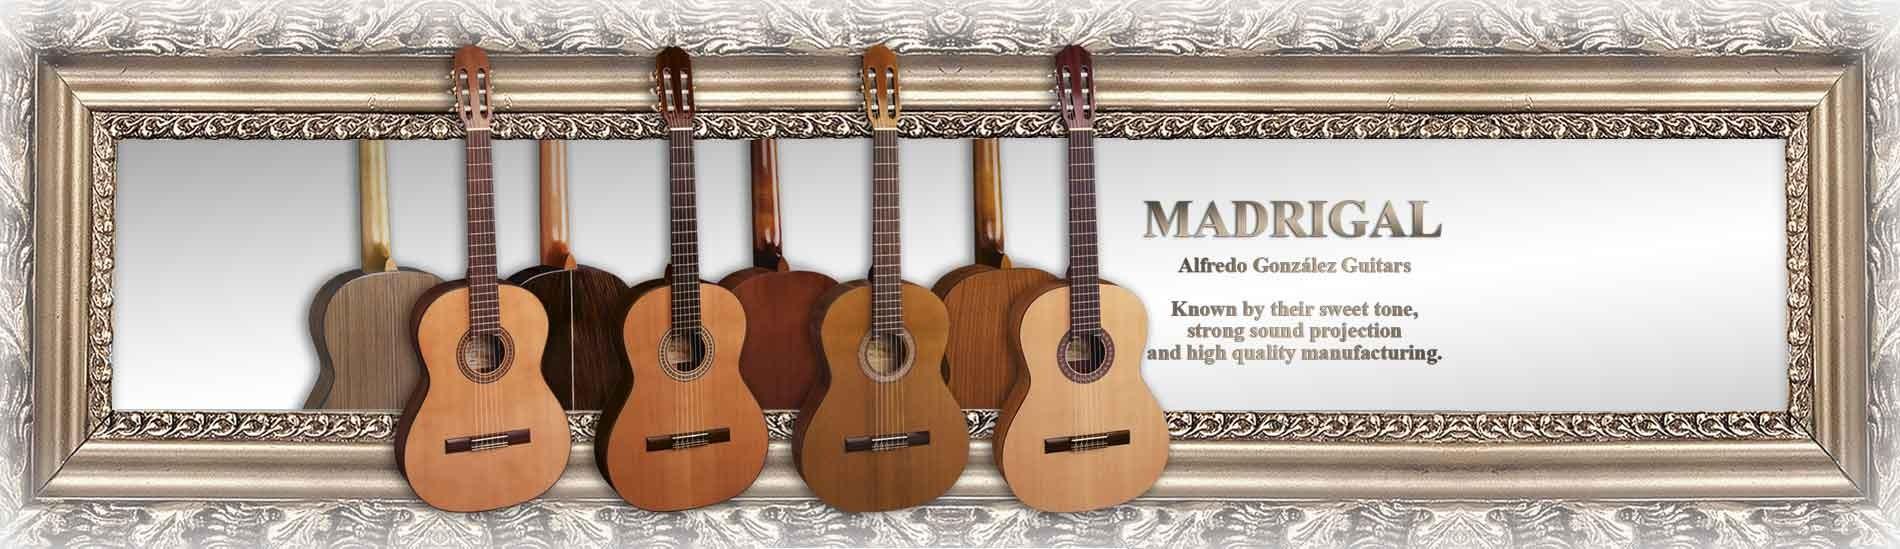 Madrigal classical guitars